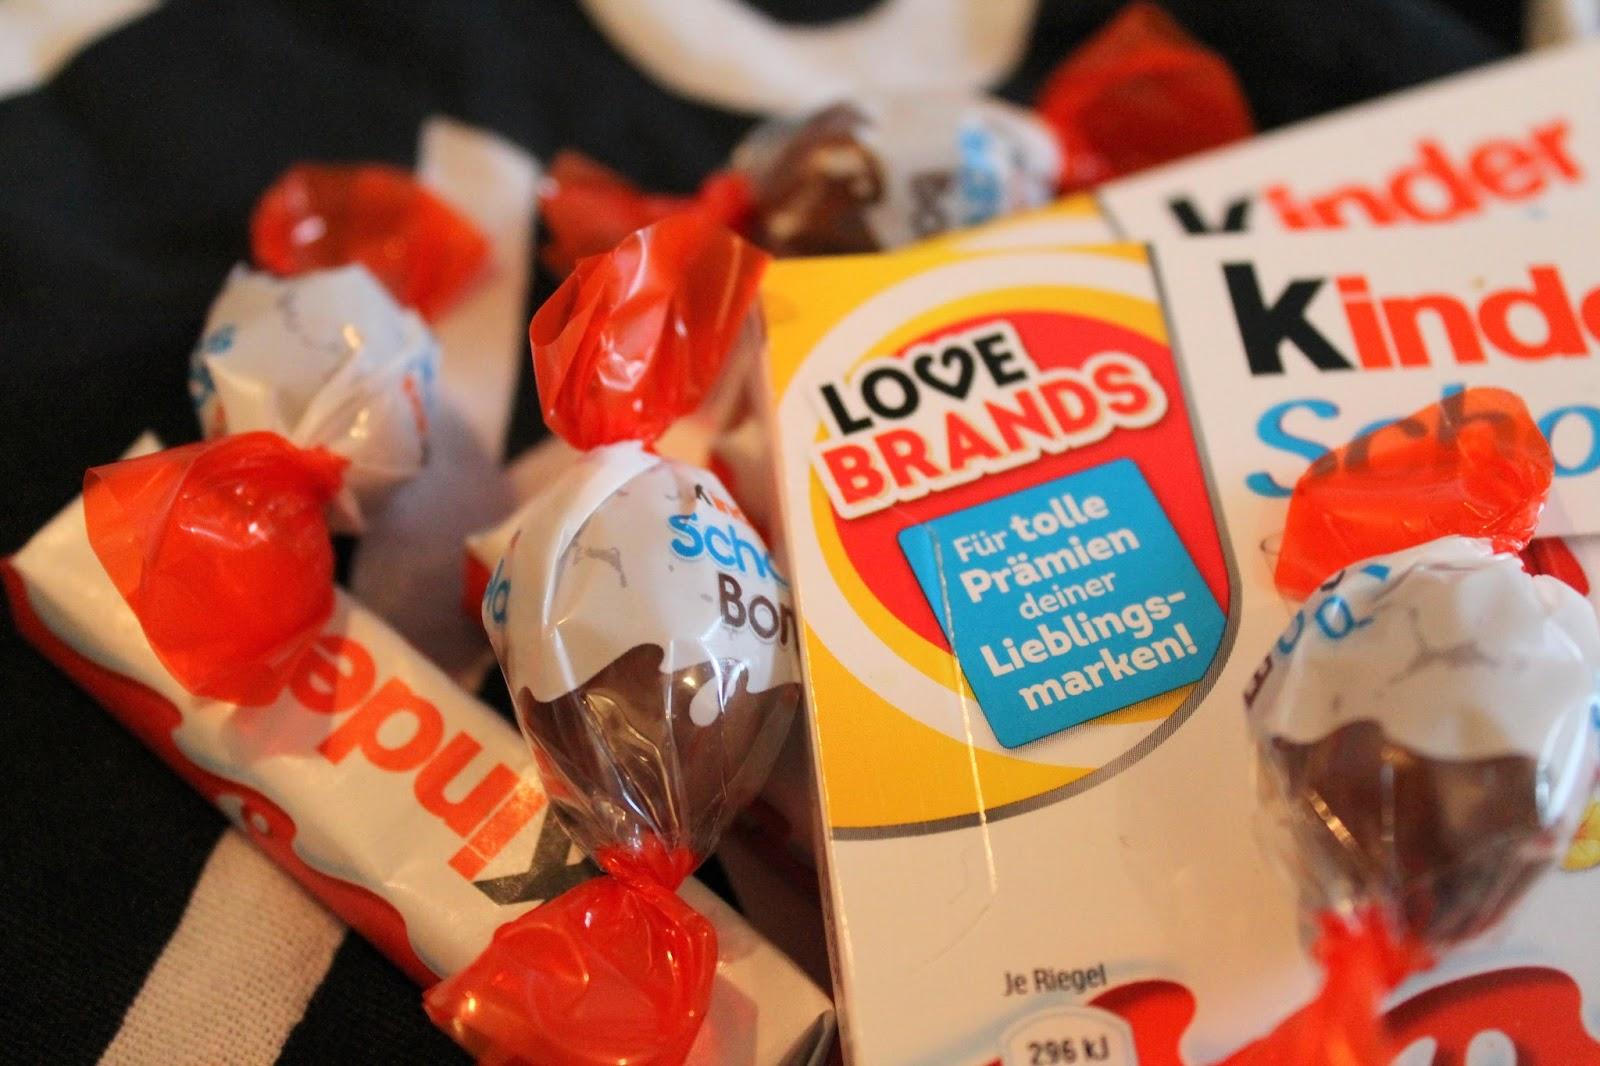 Ferrero Lovebrands Kinderschokolade Schoko-Bons